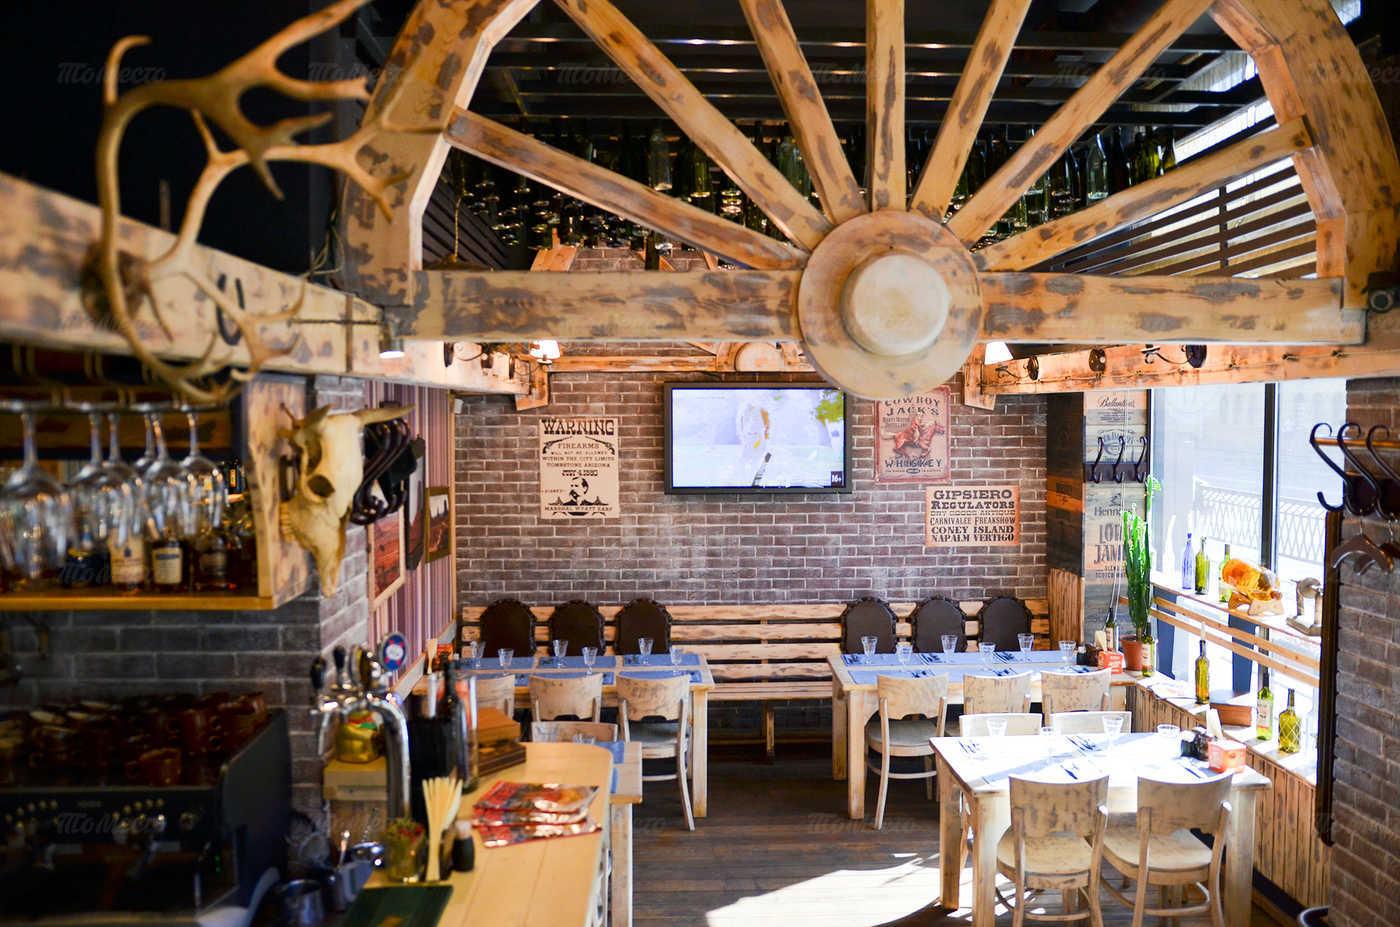 Ресторан Монтана (Montana saloon) на Кирочной улице фото 17